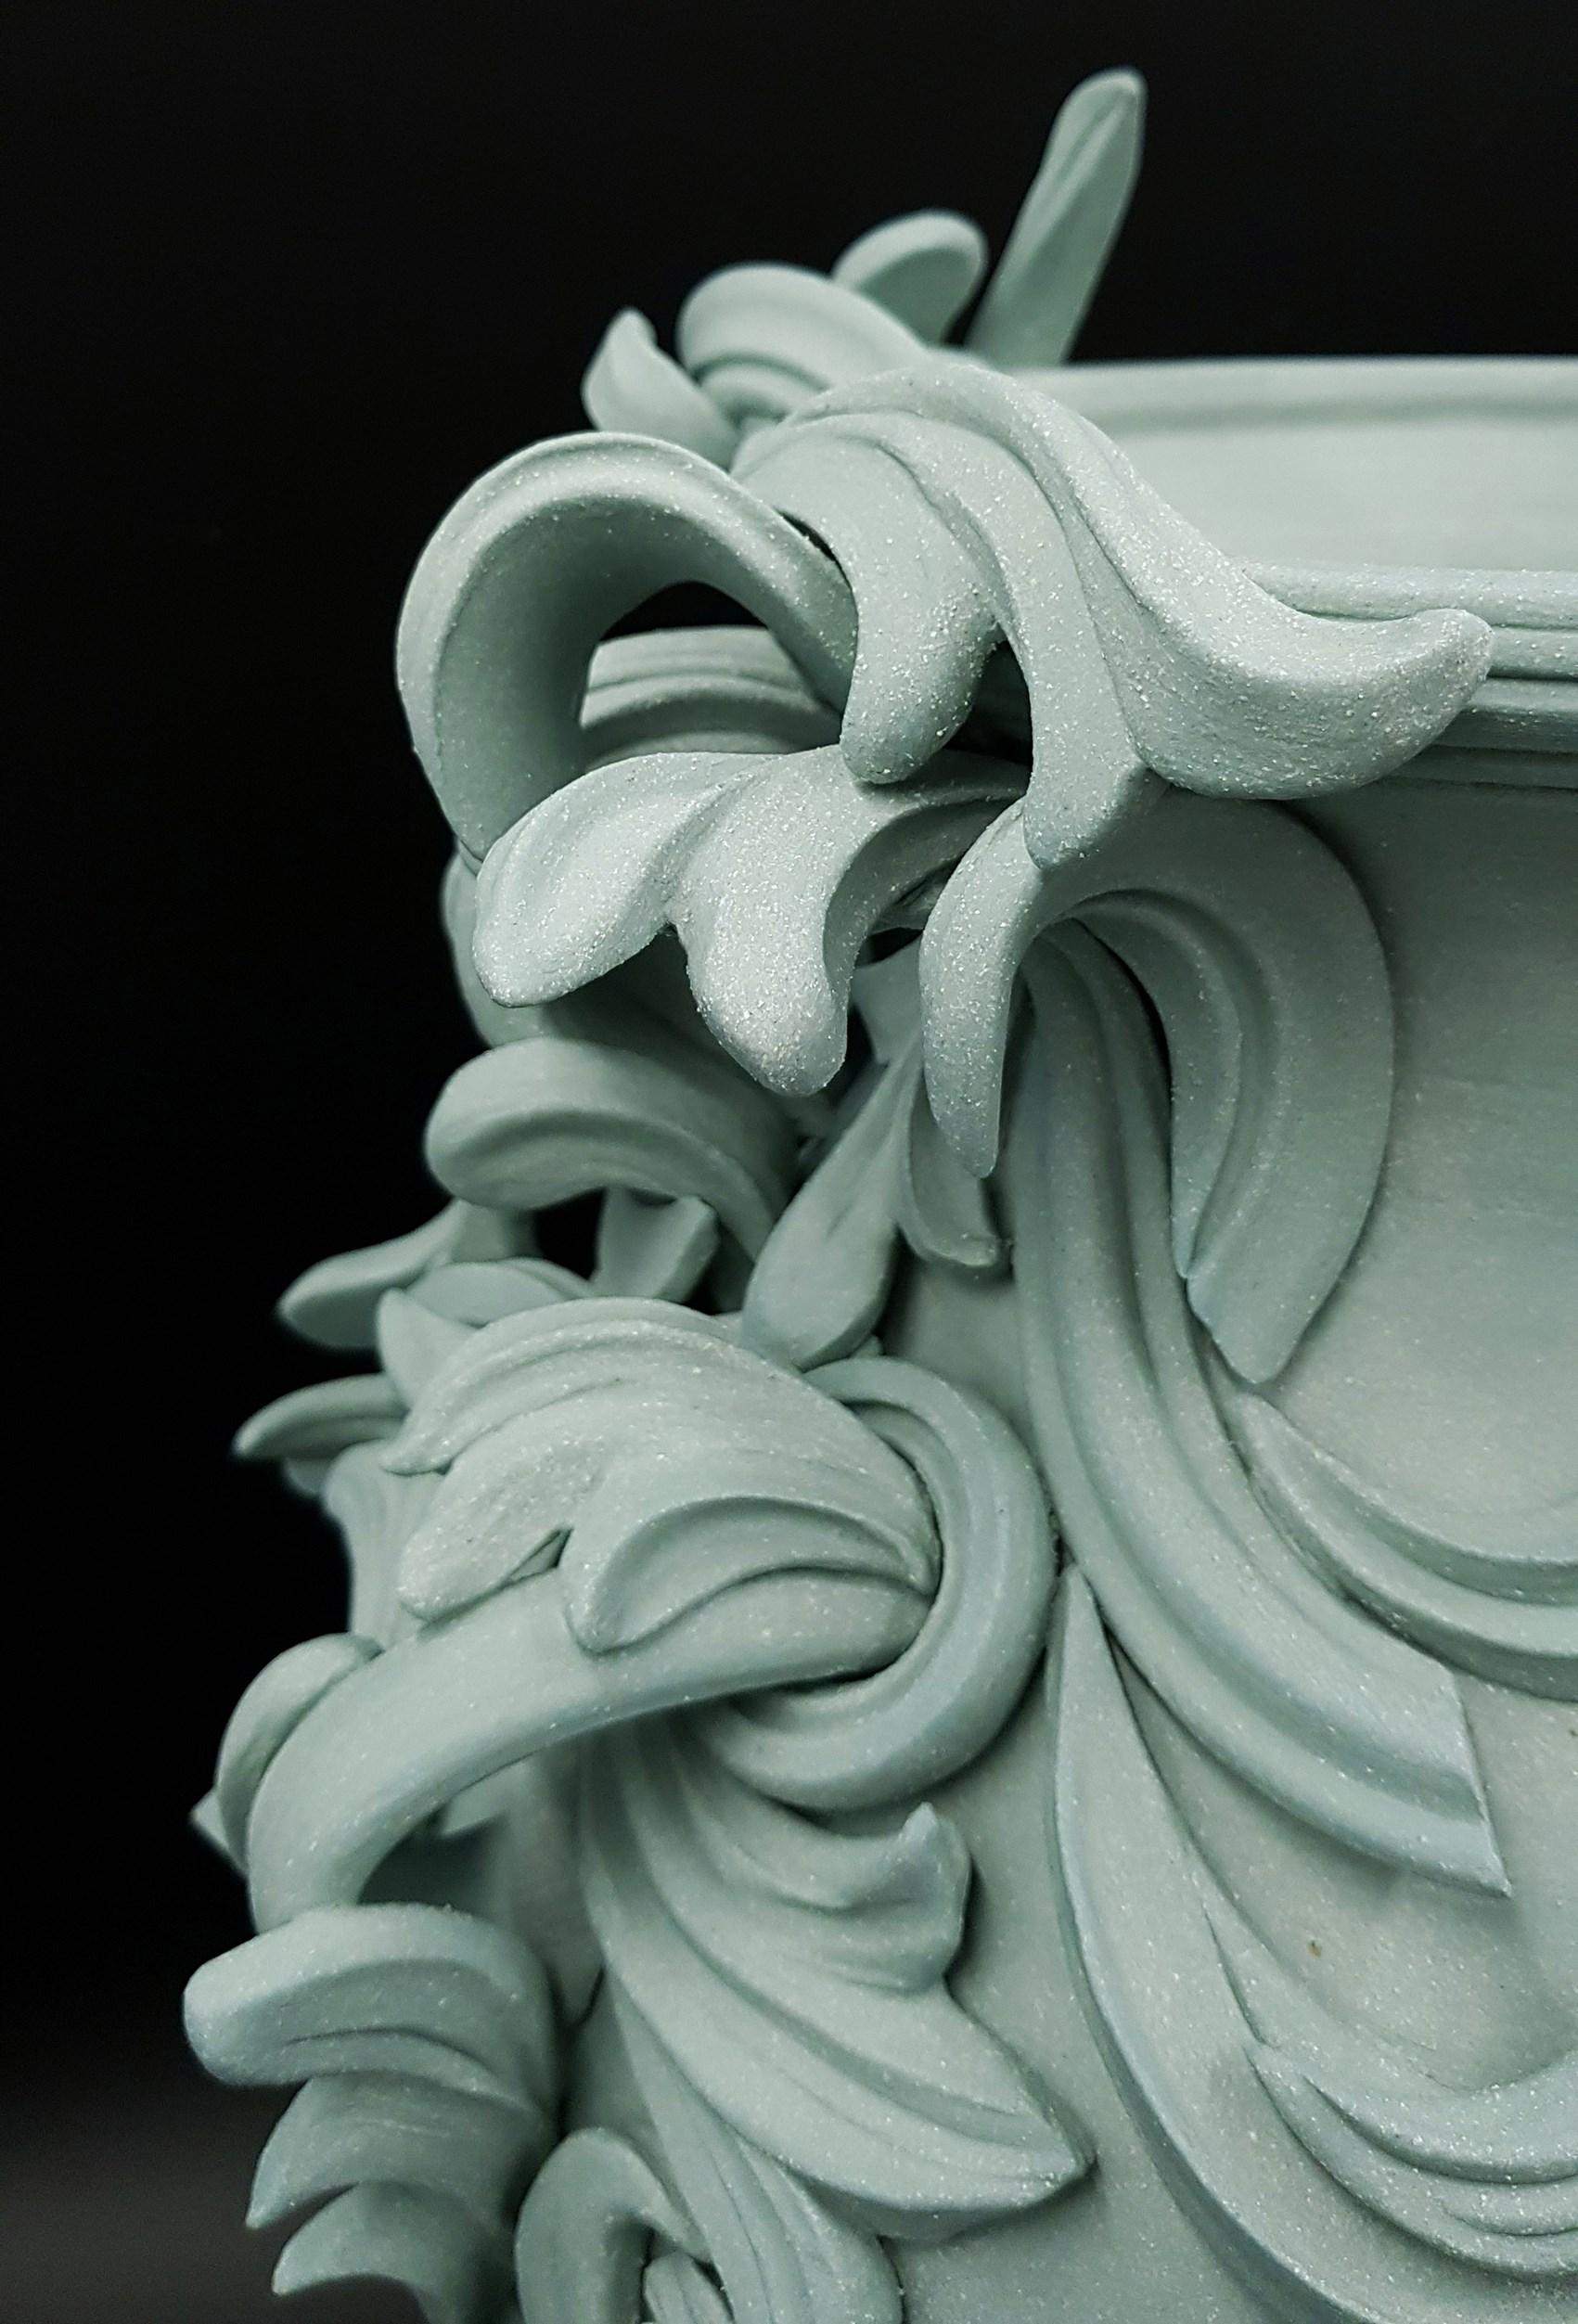 jo taylor vari capitelli sculpture ceramic detail